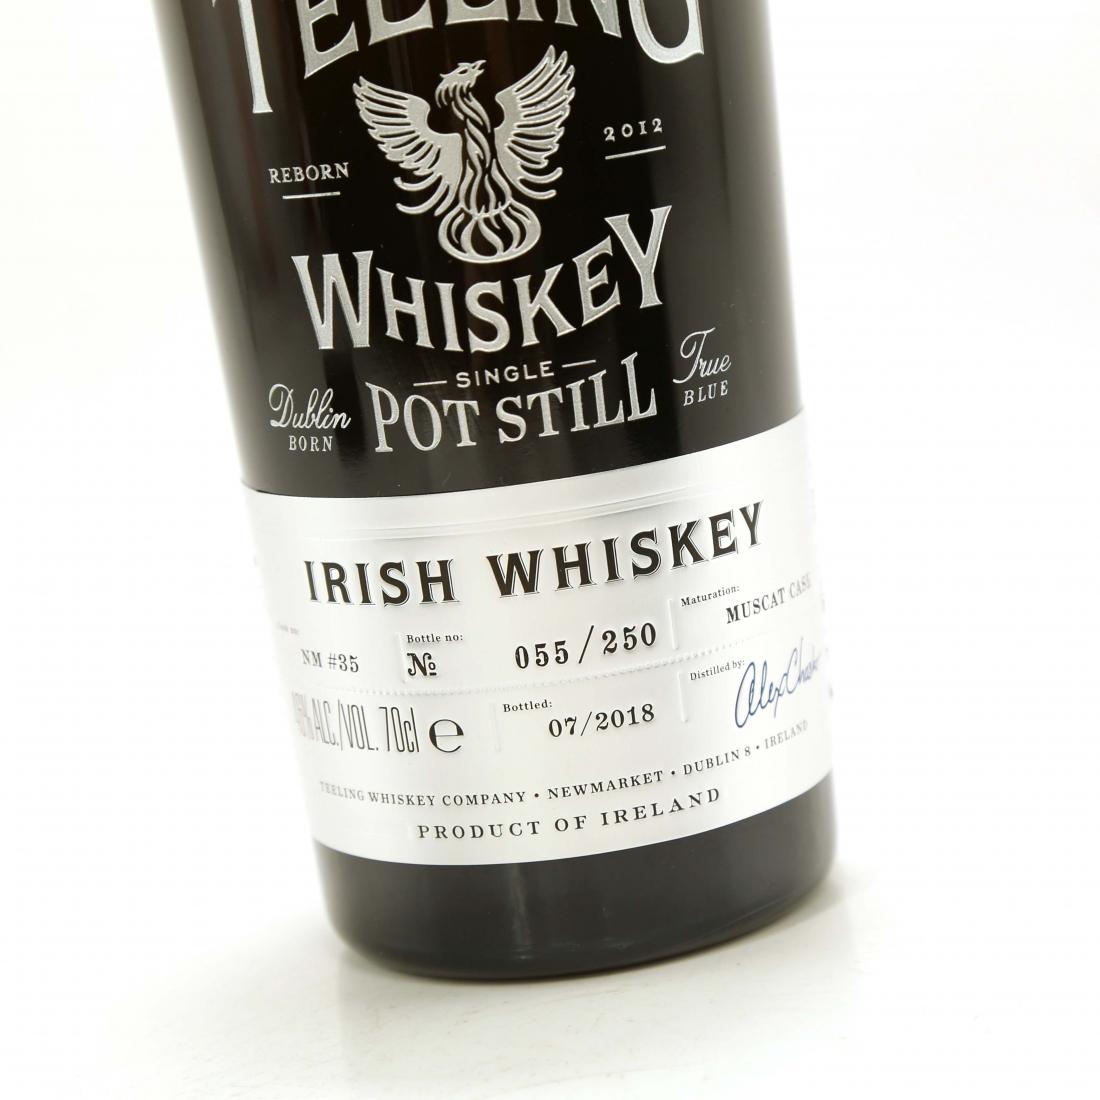 Teeling Celebratory Single Pot Still Whiskey / Bottle #055